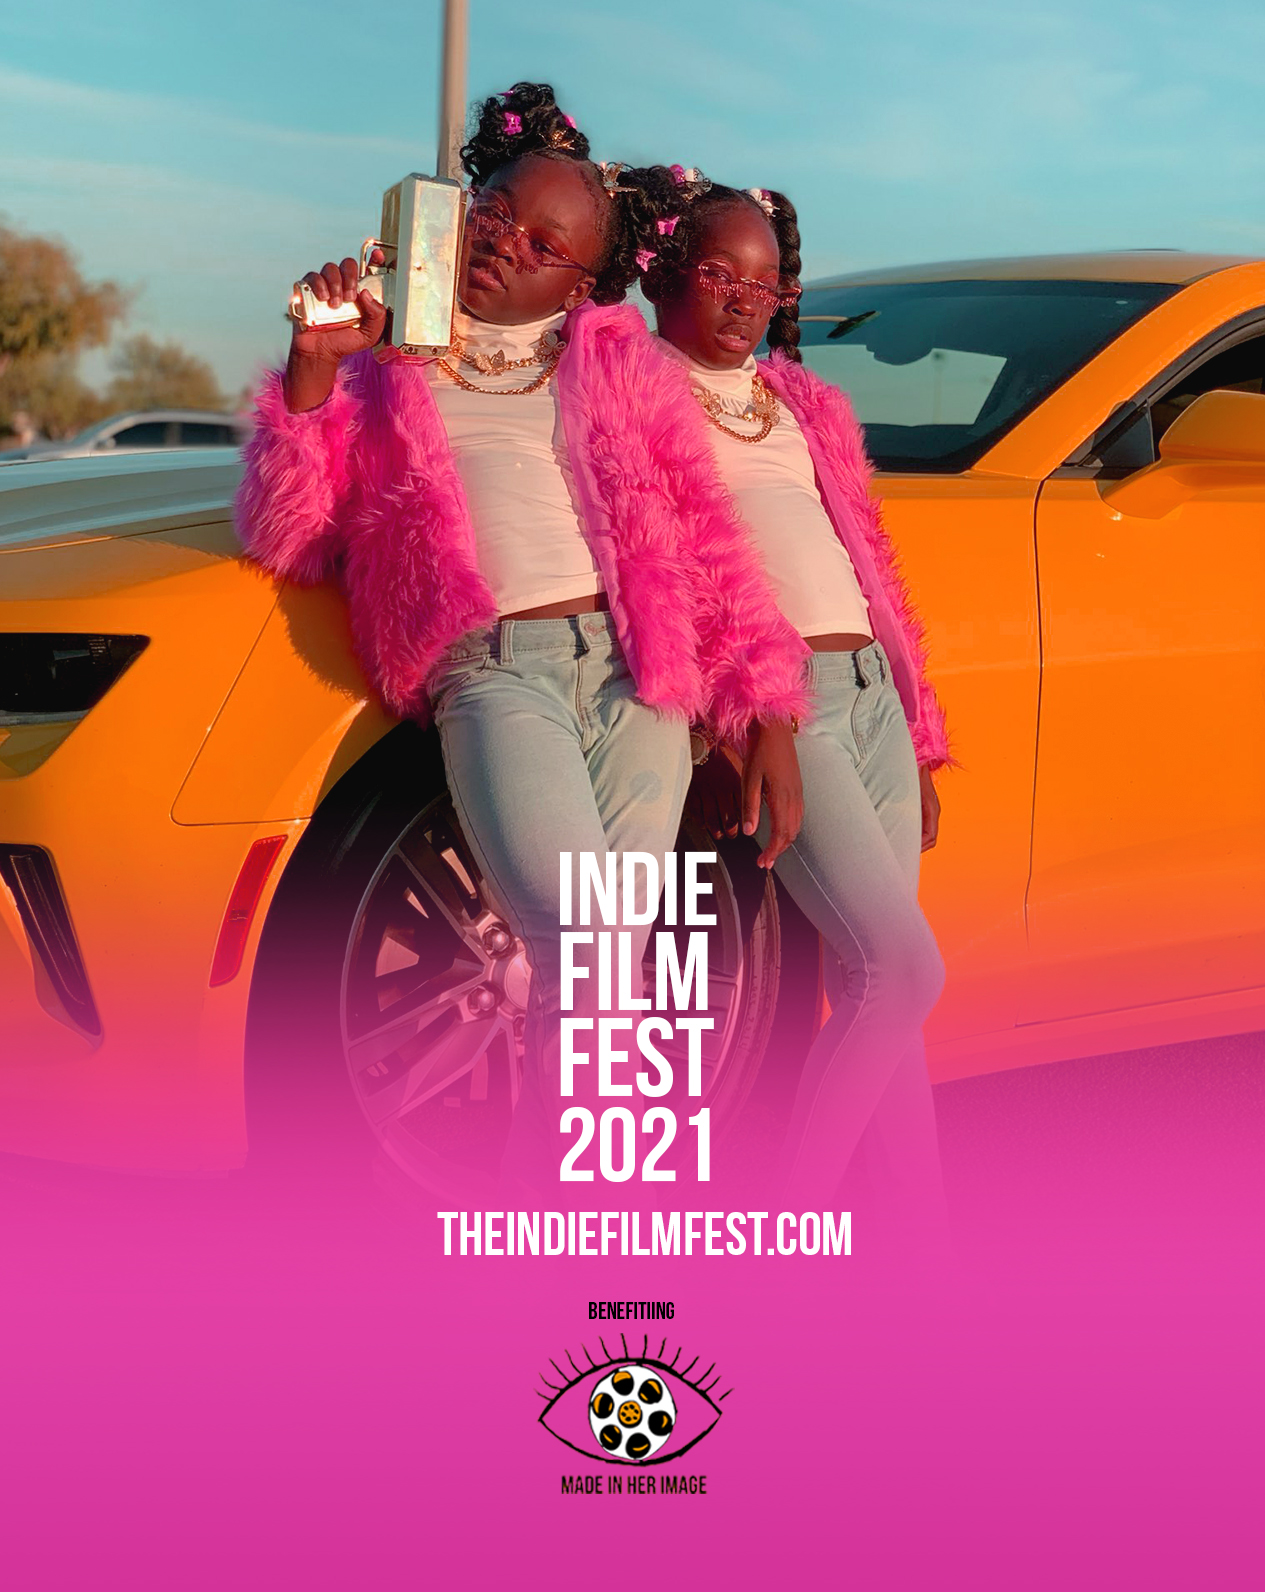 Indiefilmfest-2021mianimage copy